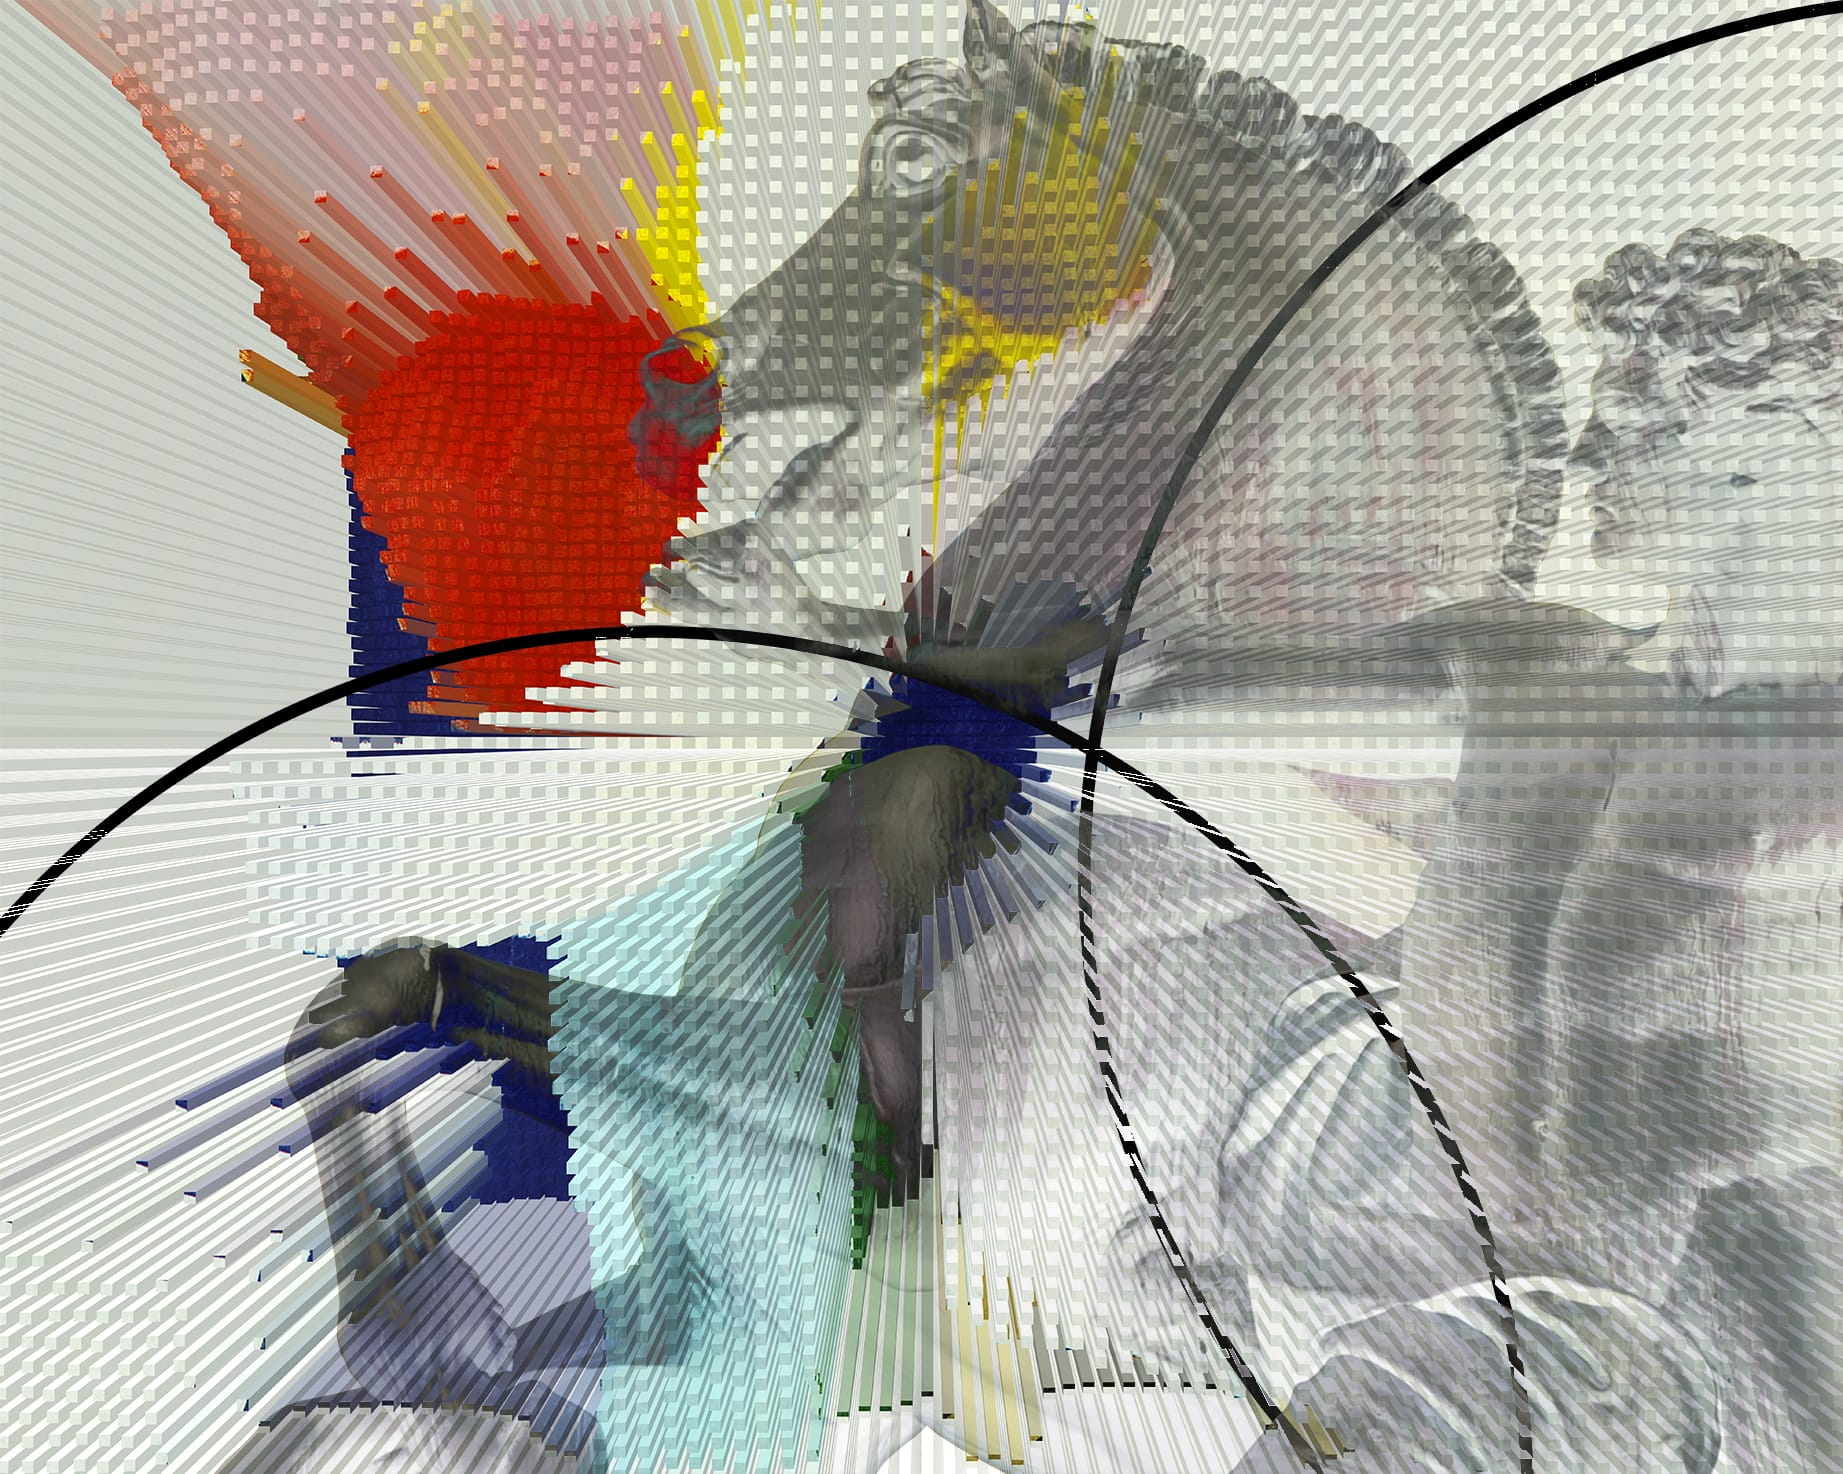 Antonio Mazzetti - La mia Arte